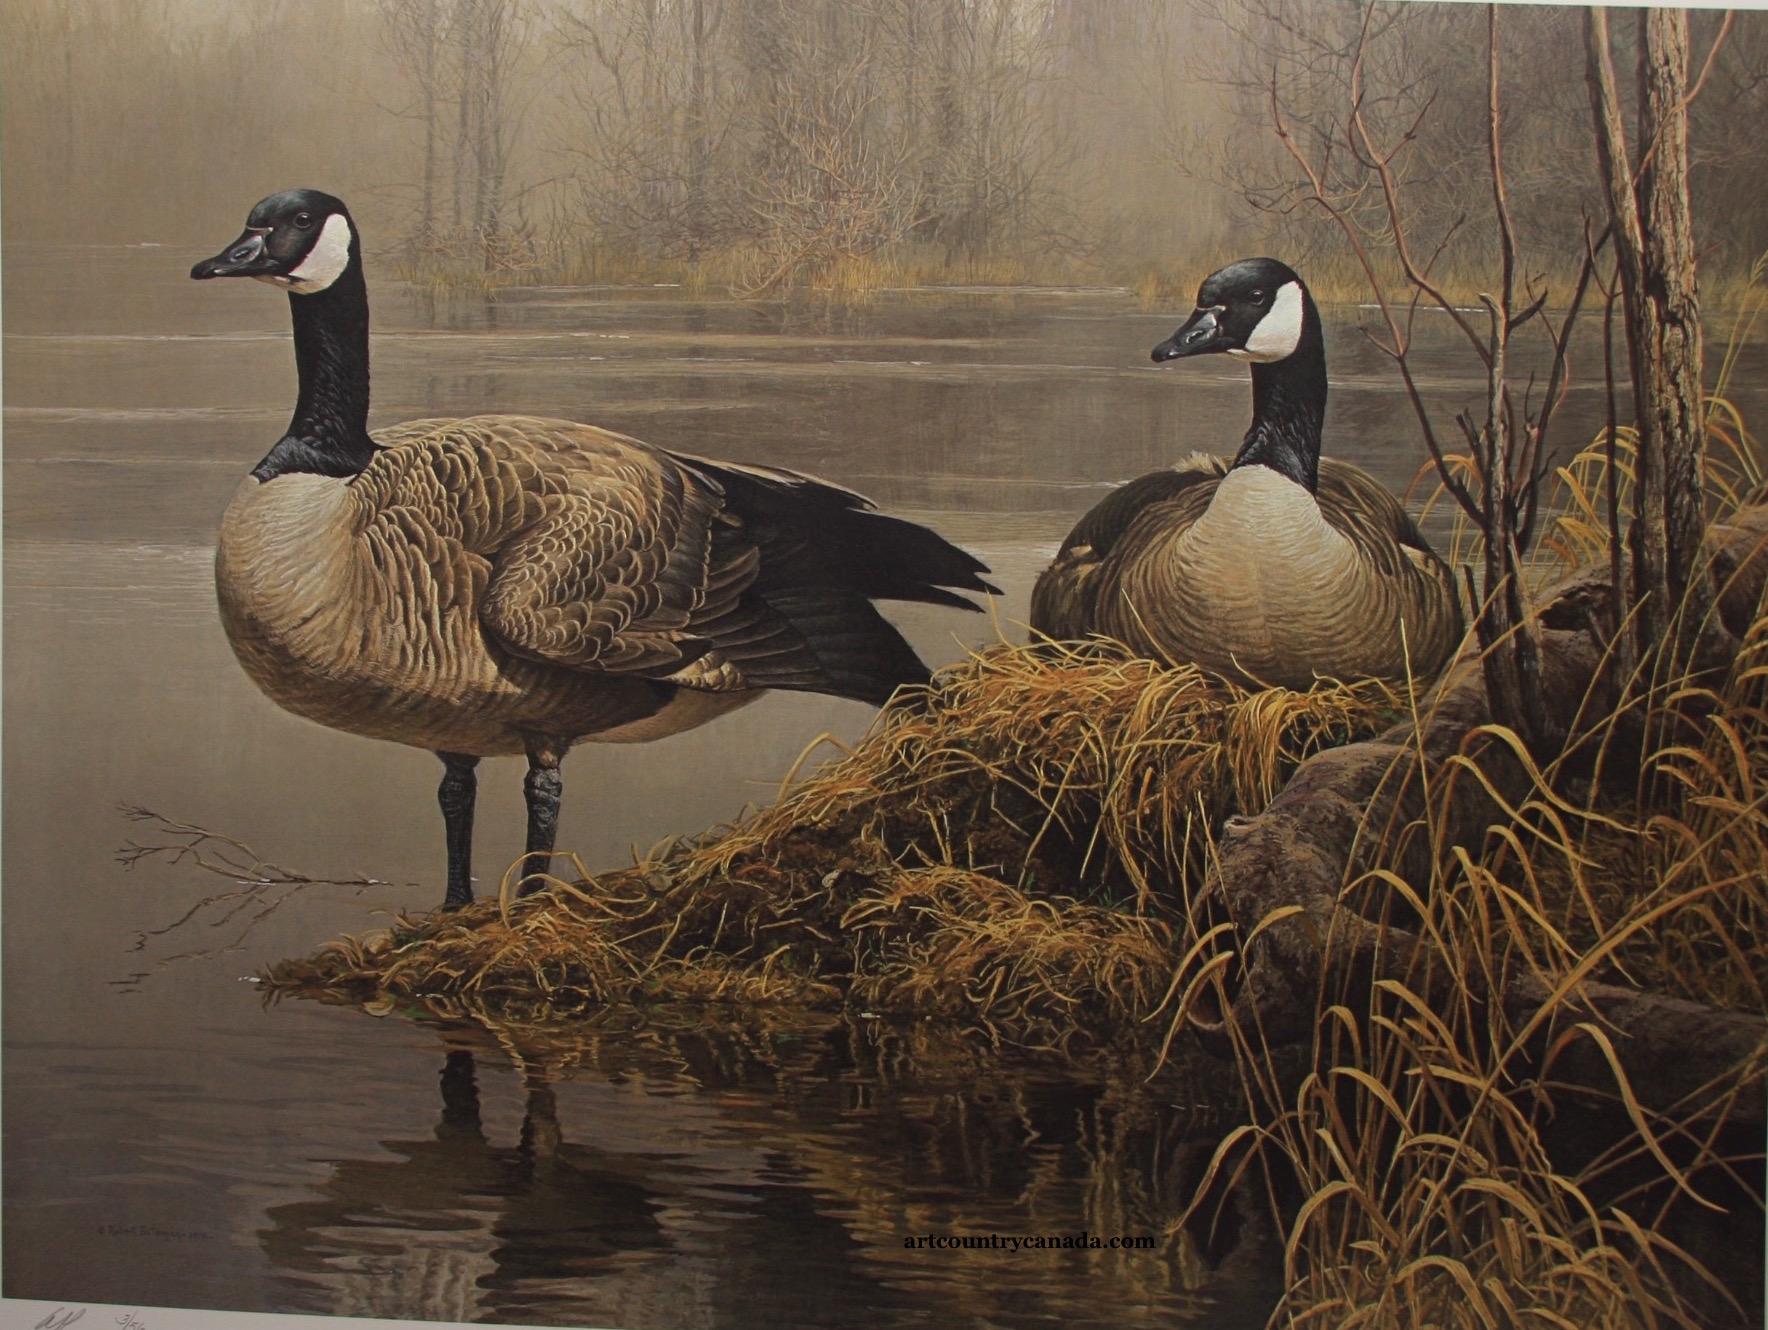 Robert bateman canada Geese Nesting